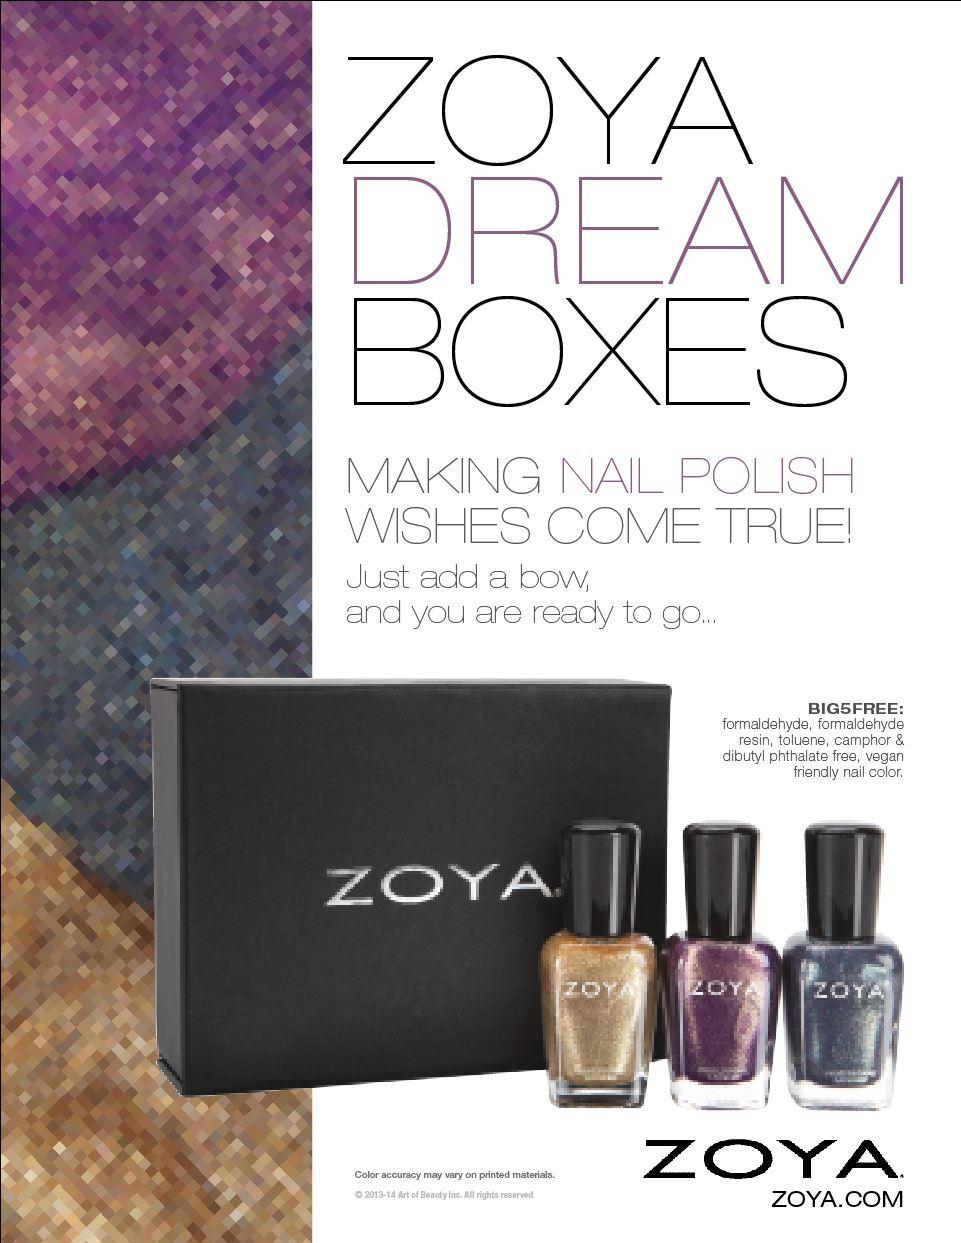 Zoya_Nail_Polish_Dream_Boxes_2013